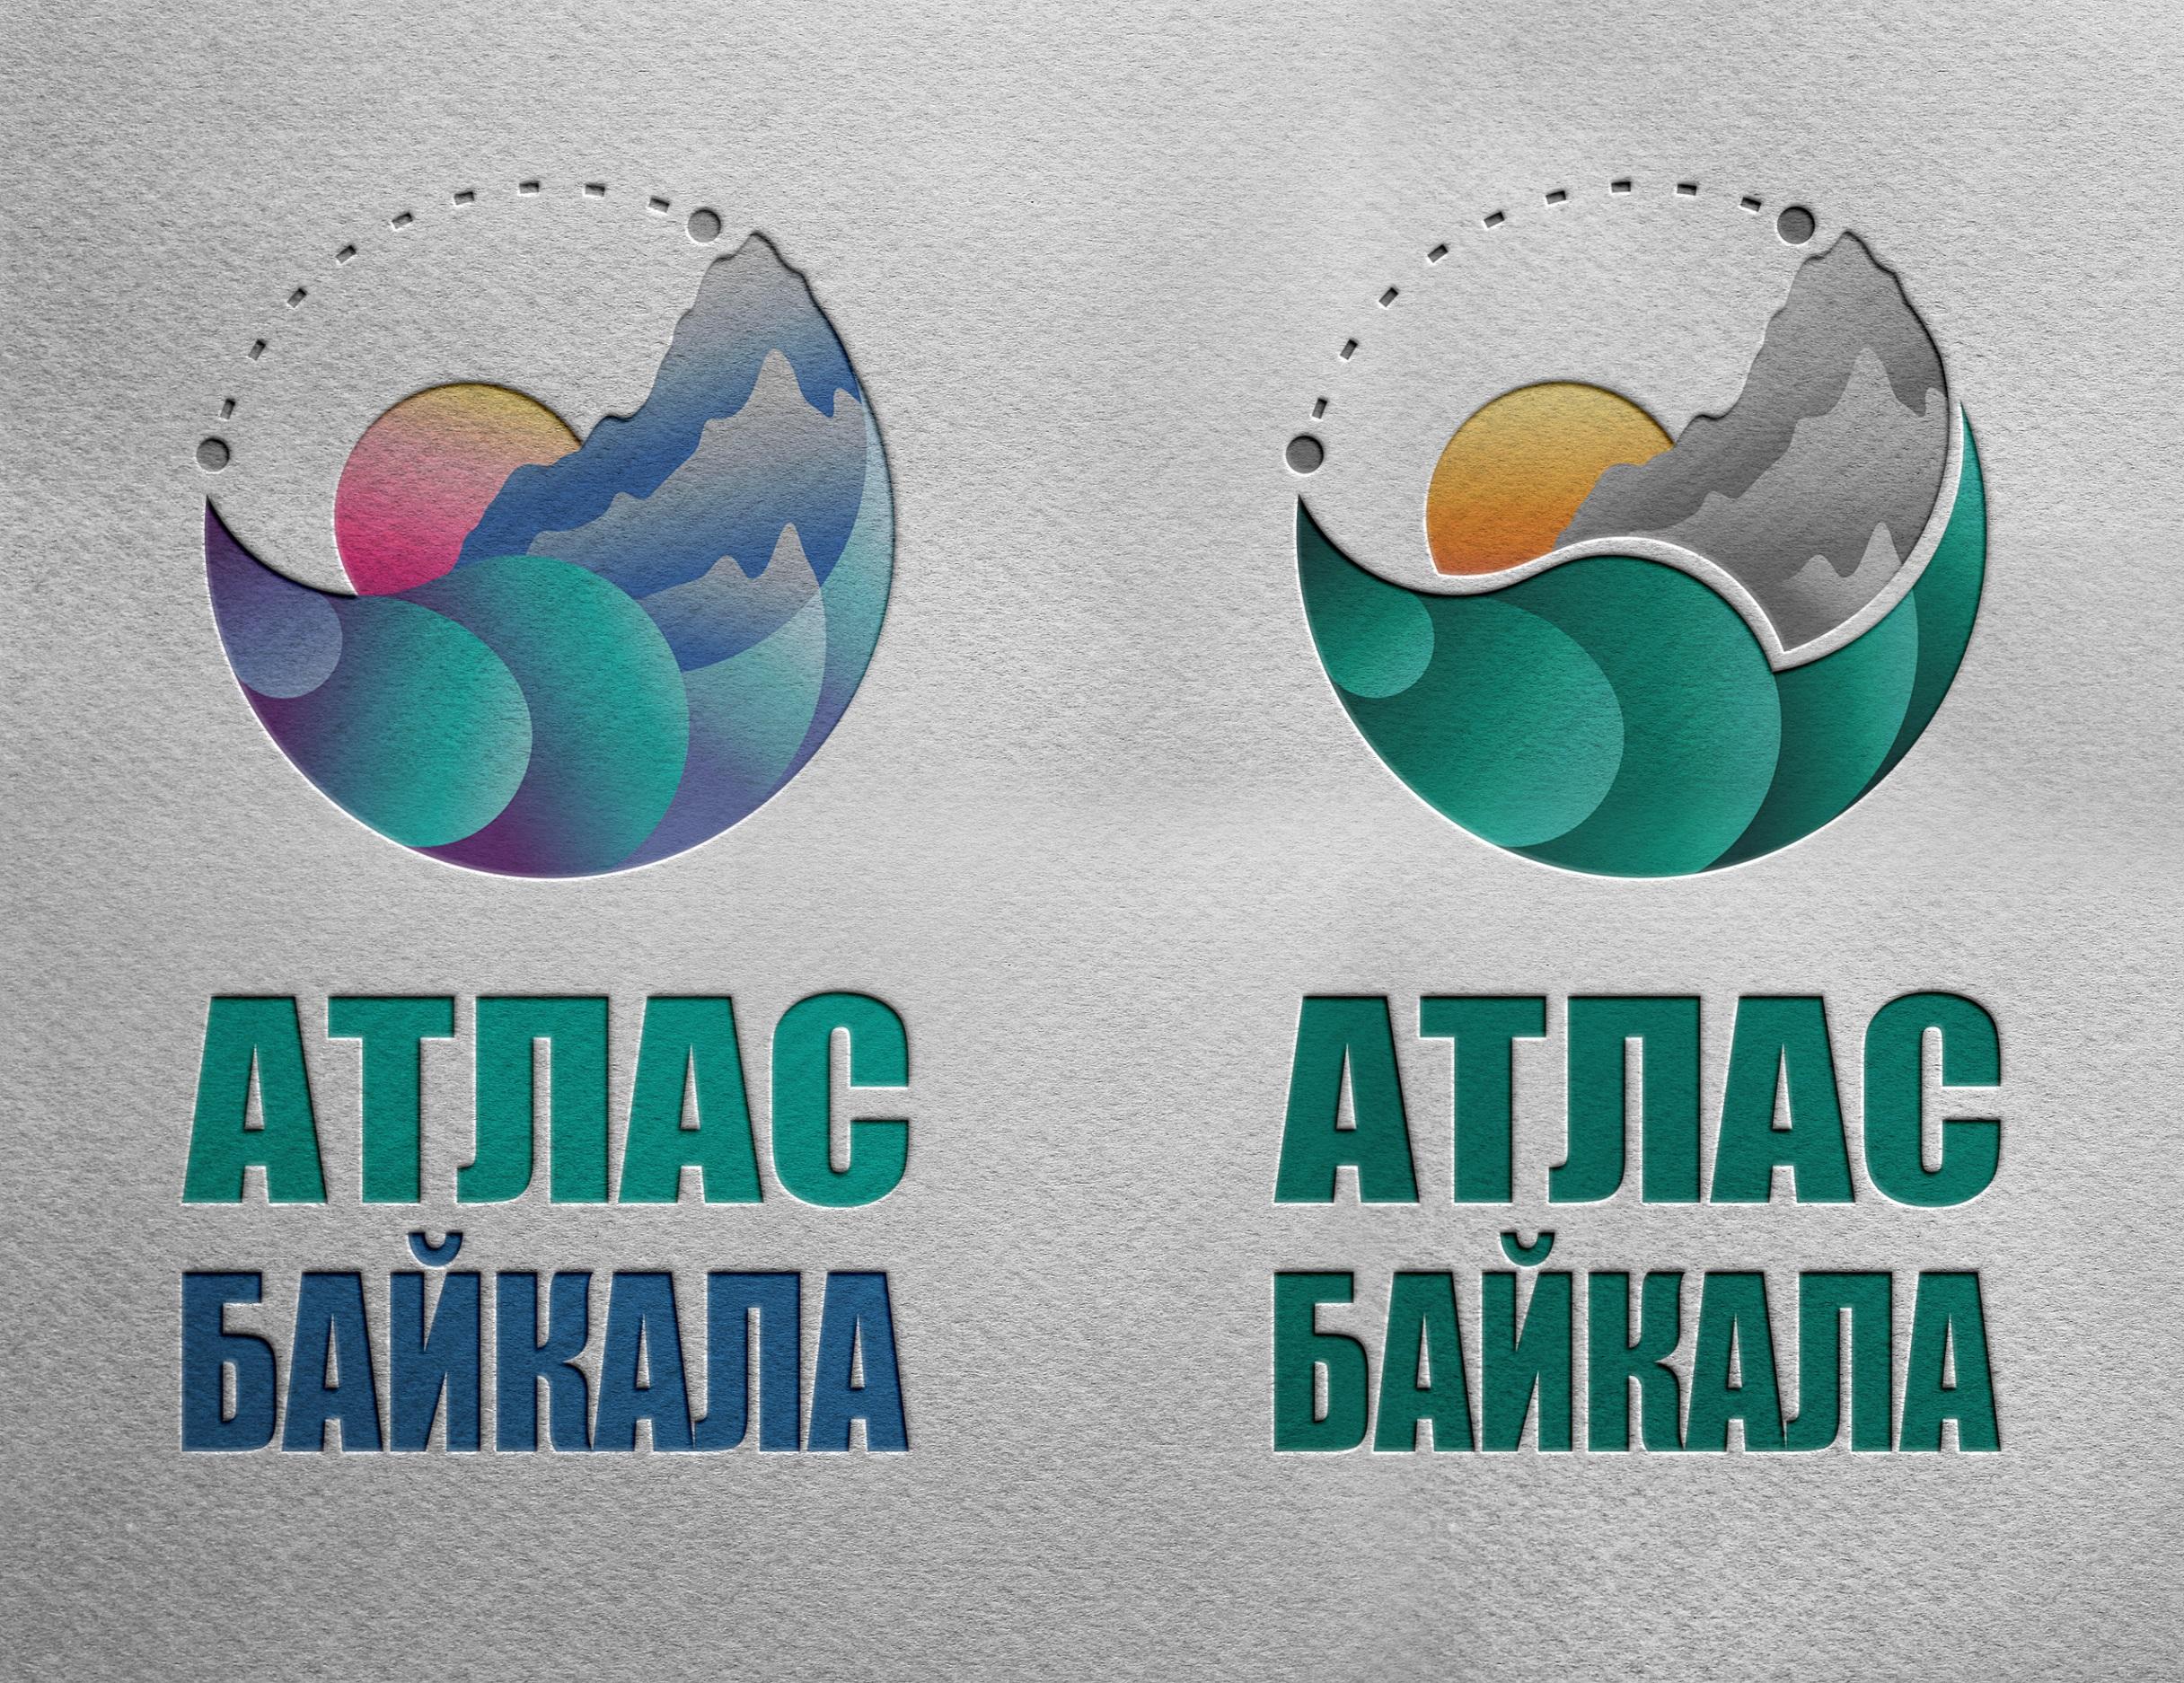 Разработка логотипа Атлас Байкала фото f_8635b1aab2a530e5.jpg